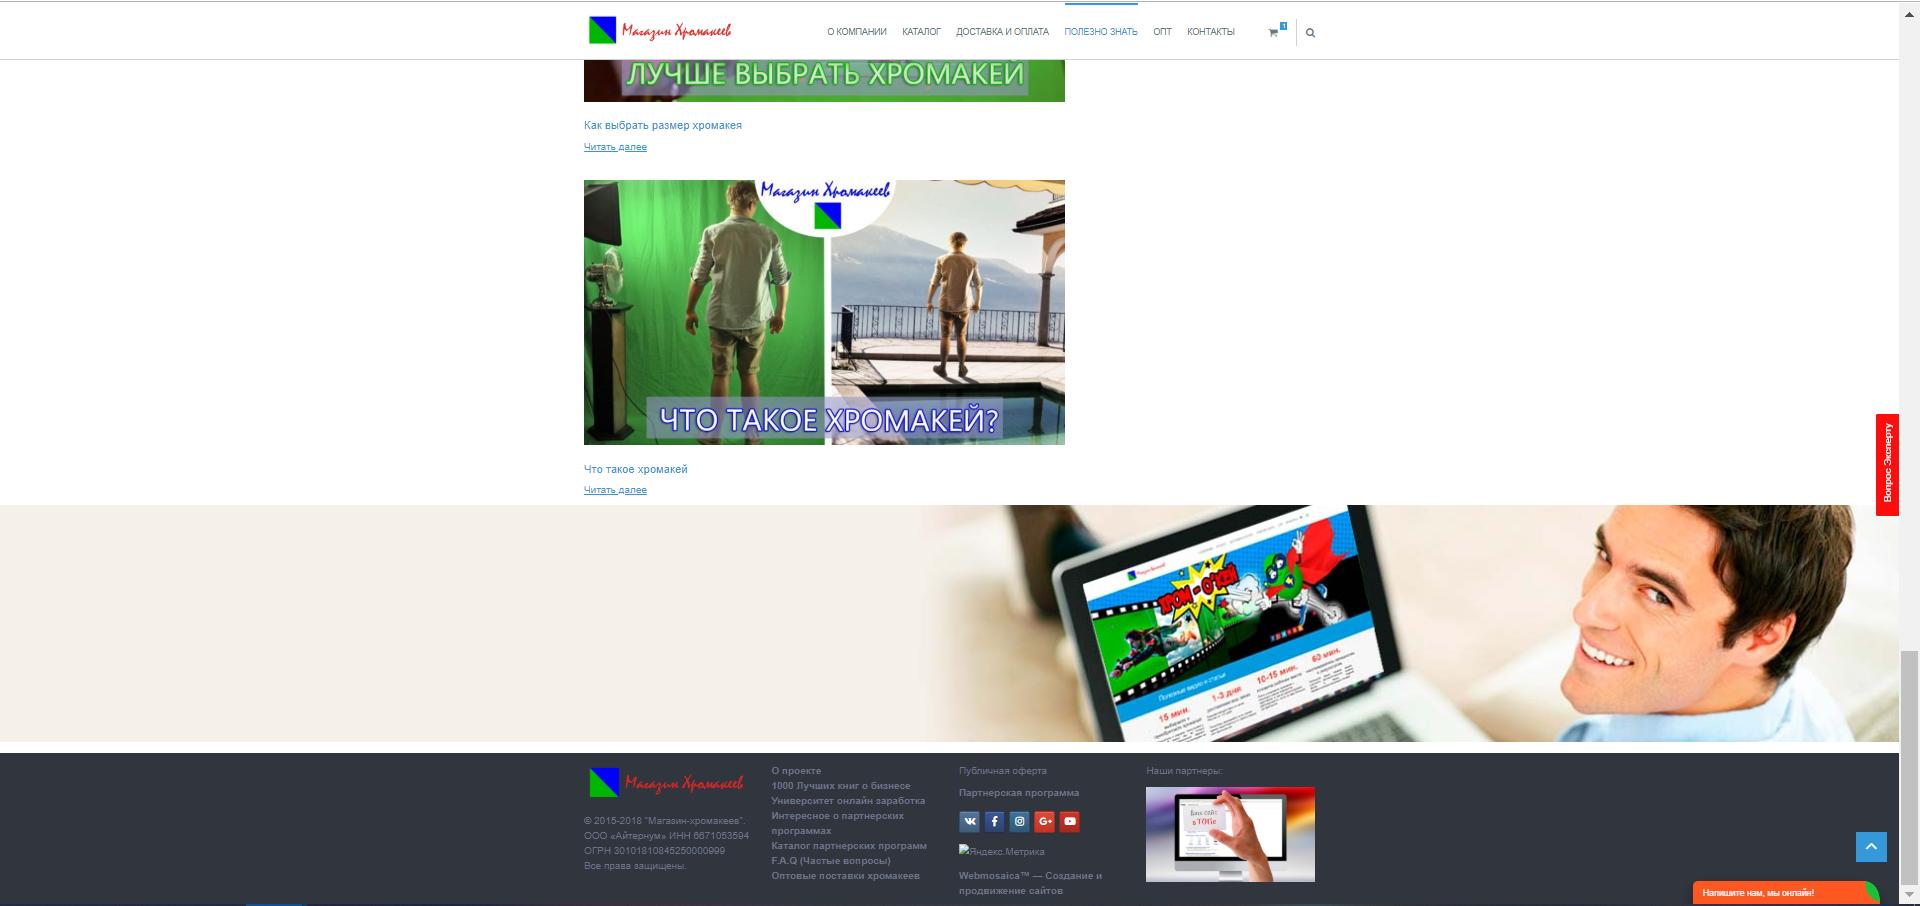 Магазин хромакеев. Блог2